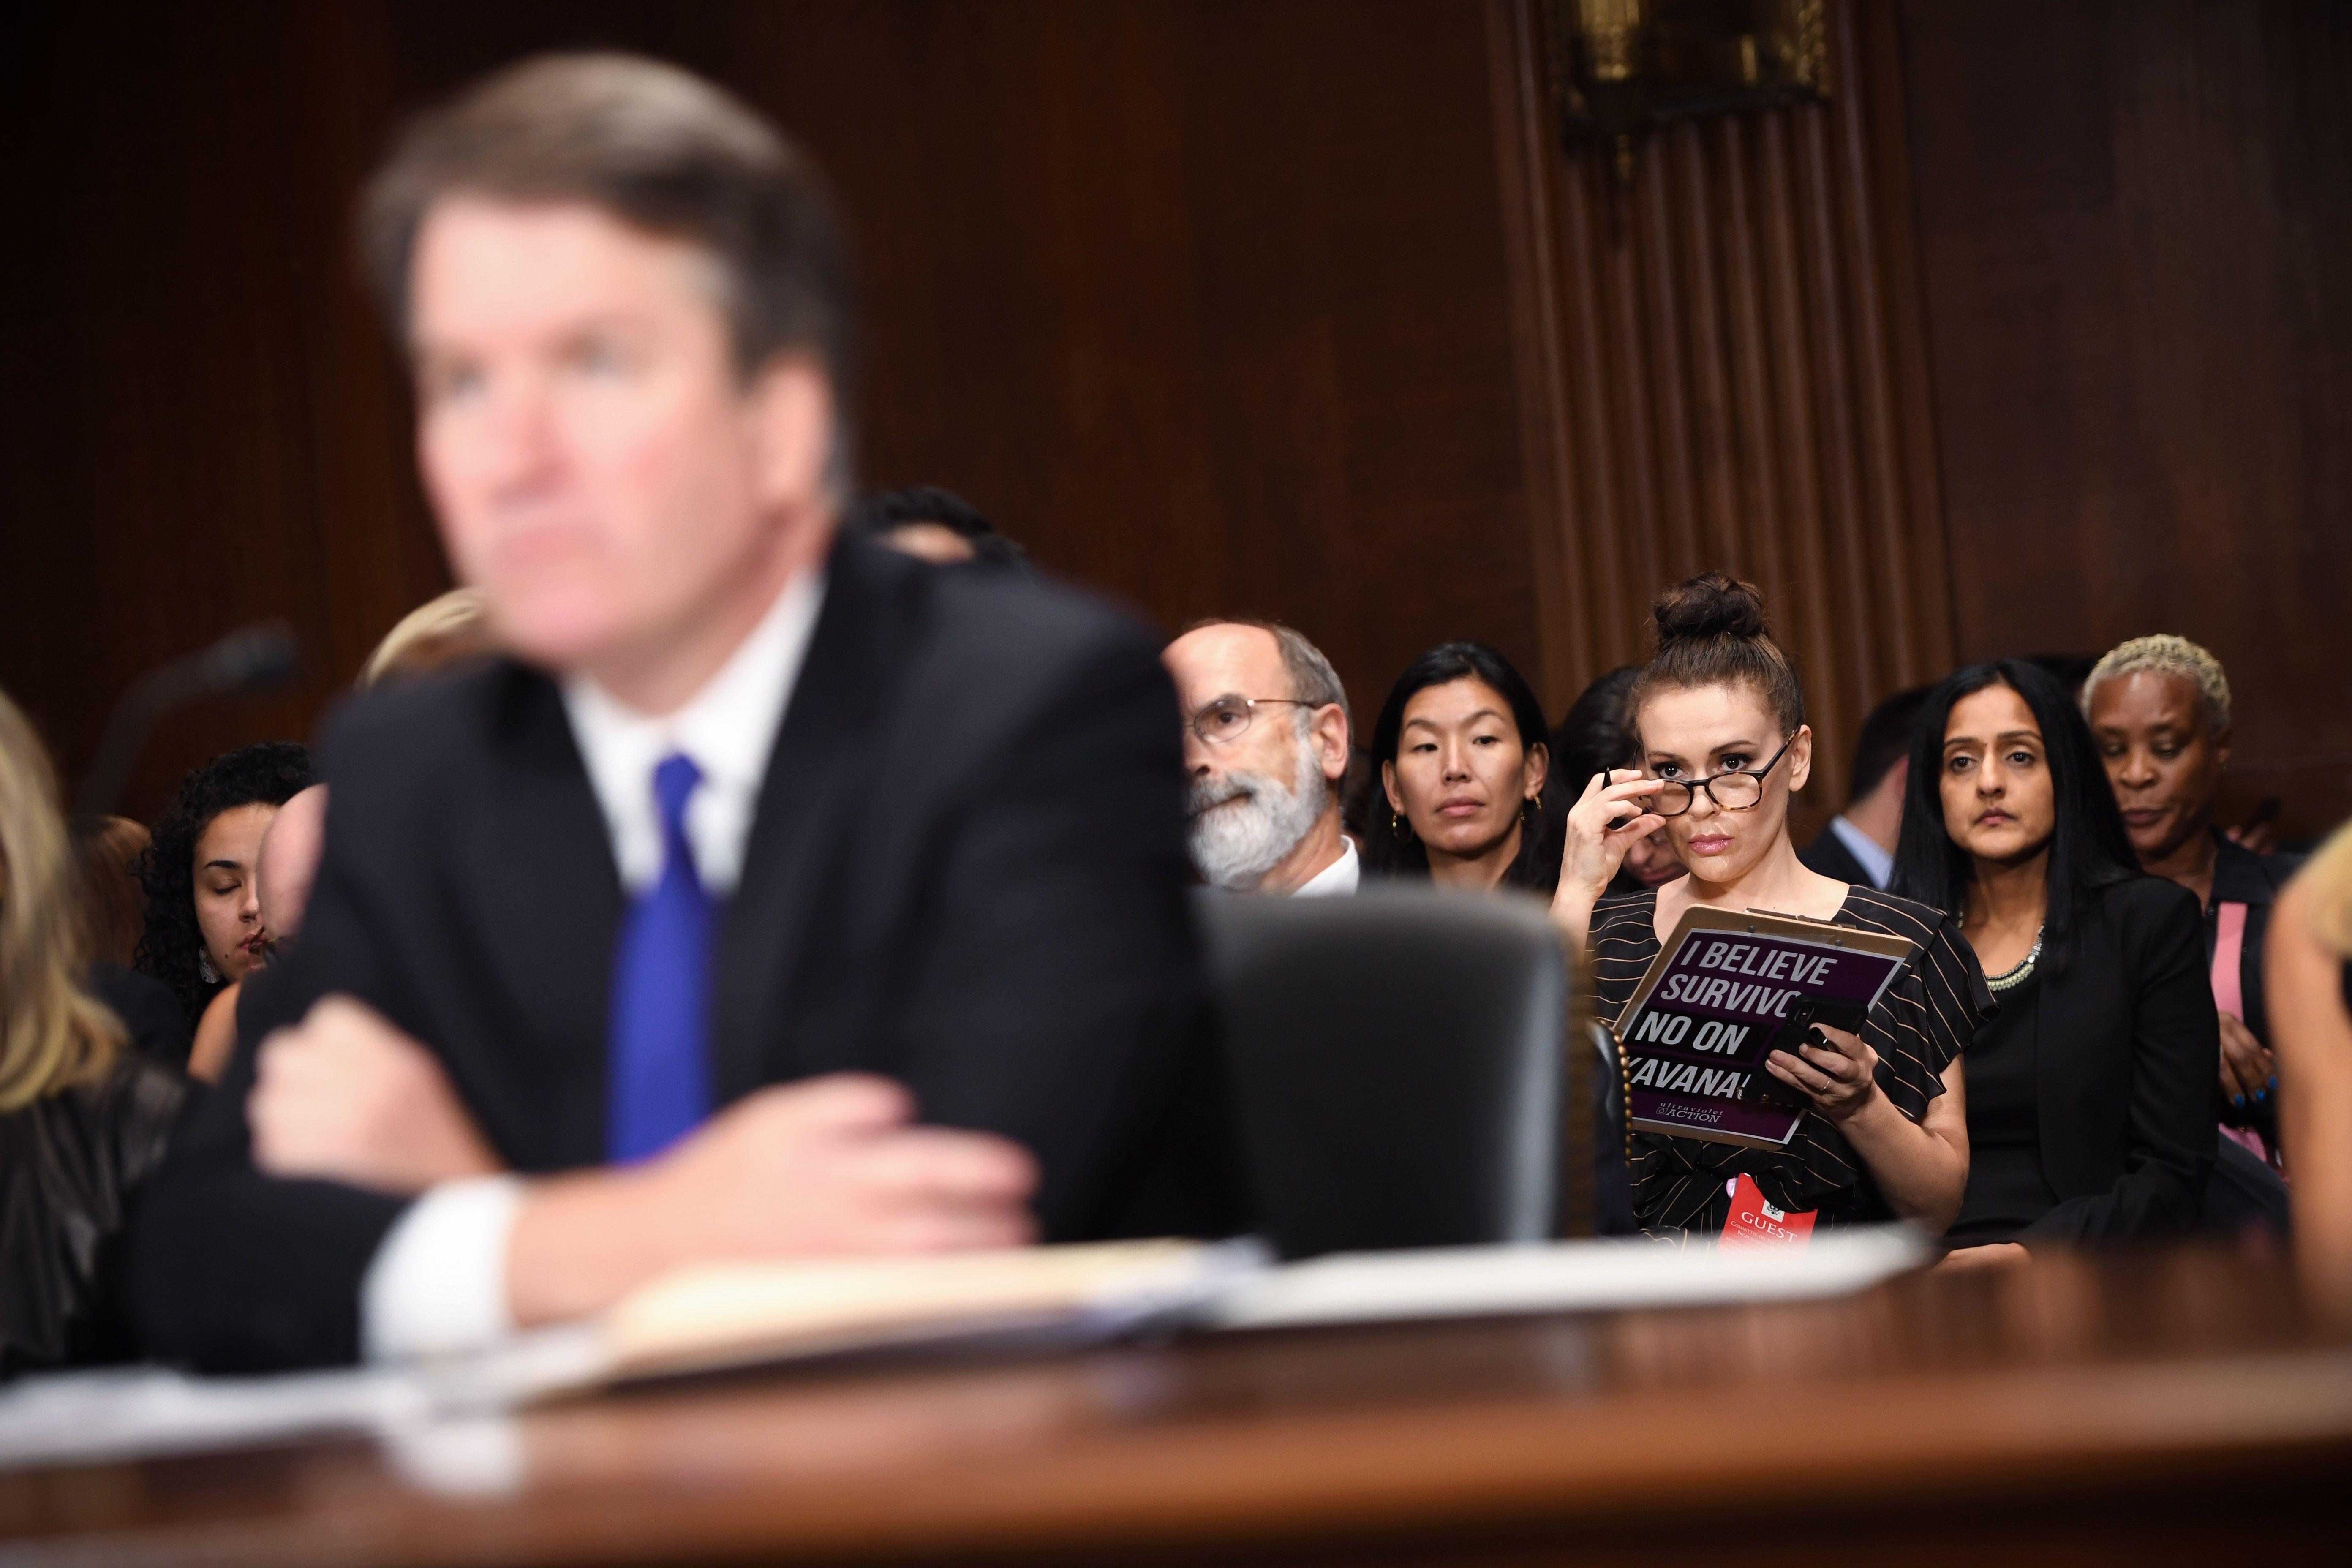 Actress and activist Alyssa Milano listens to Brett Kavanaugh. Photo: Saul Loeb - Pool /Getty Images